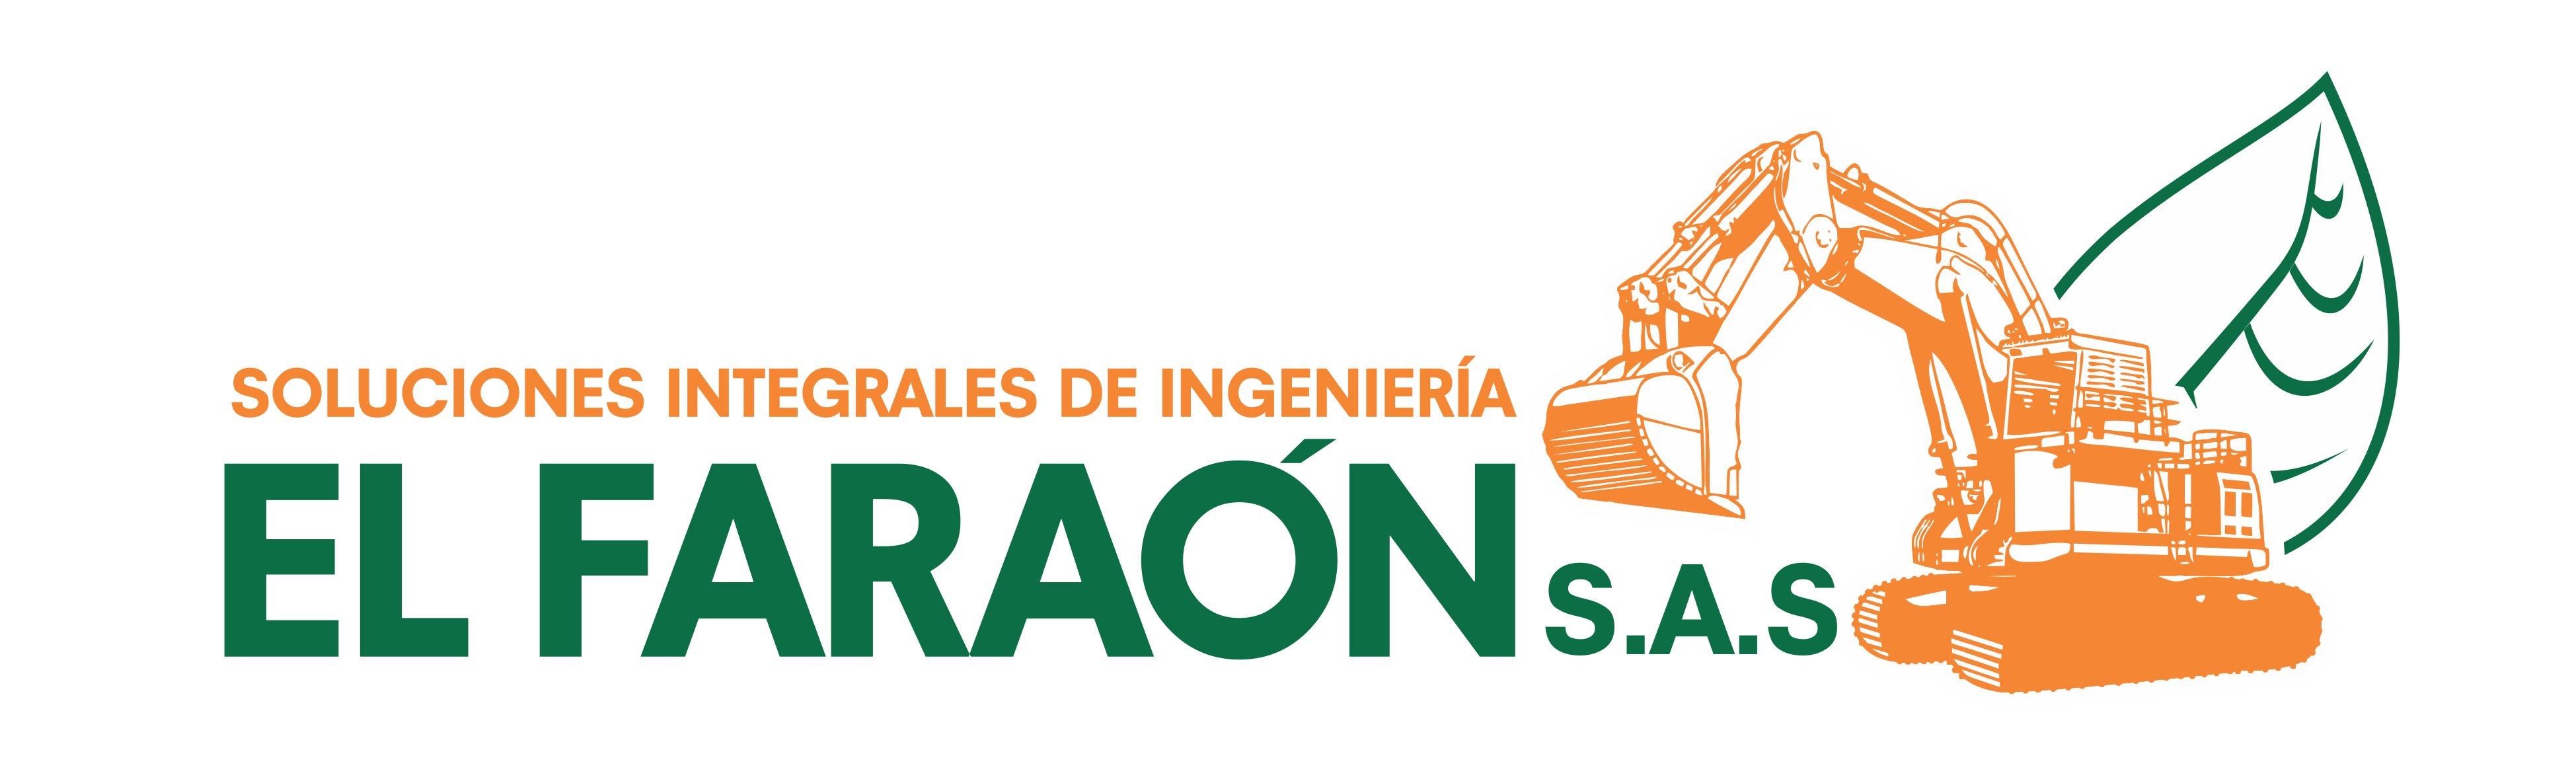 SOLUCIONES INTEGRALES DE INGENIERIA EL FARAON S.A.S.